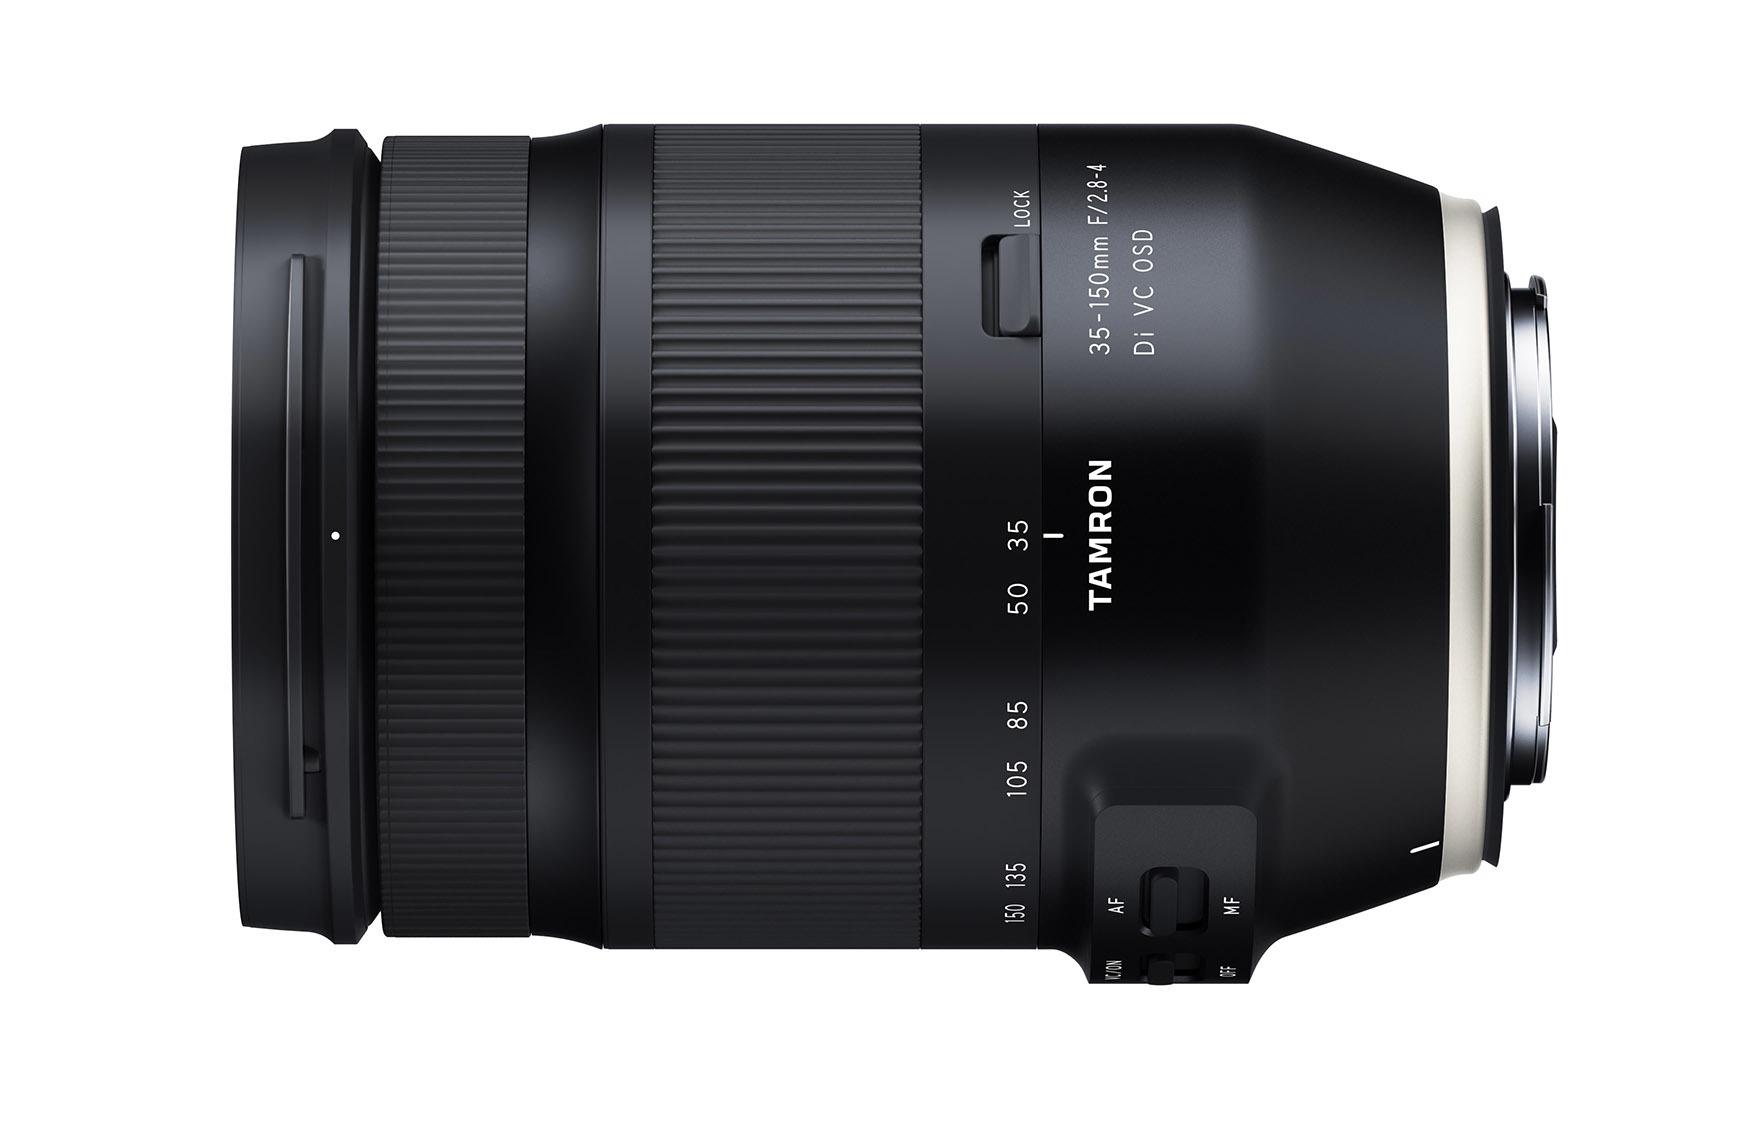 Tamron 35-150mm topside.jpg